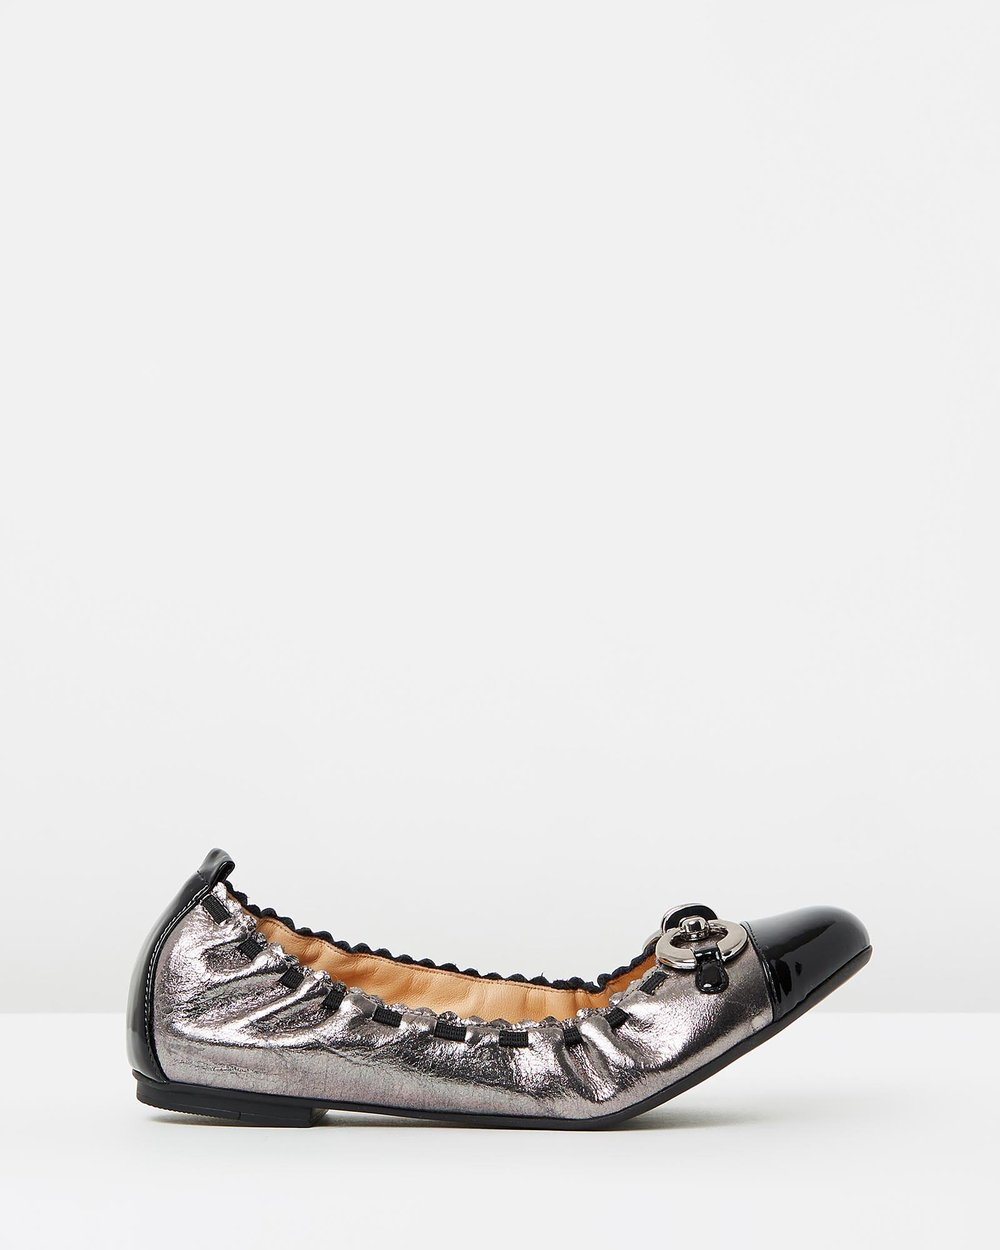 Bree - Black & Old Silver